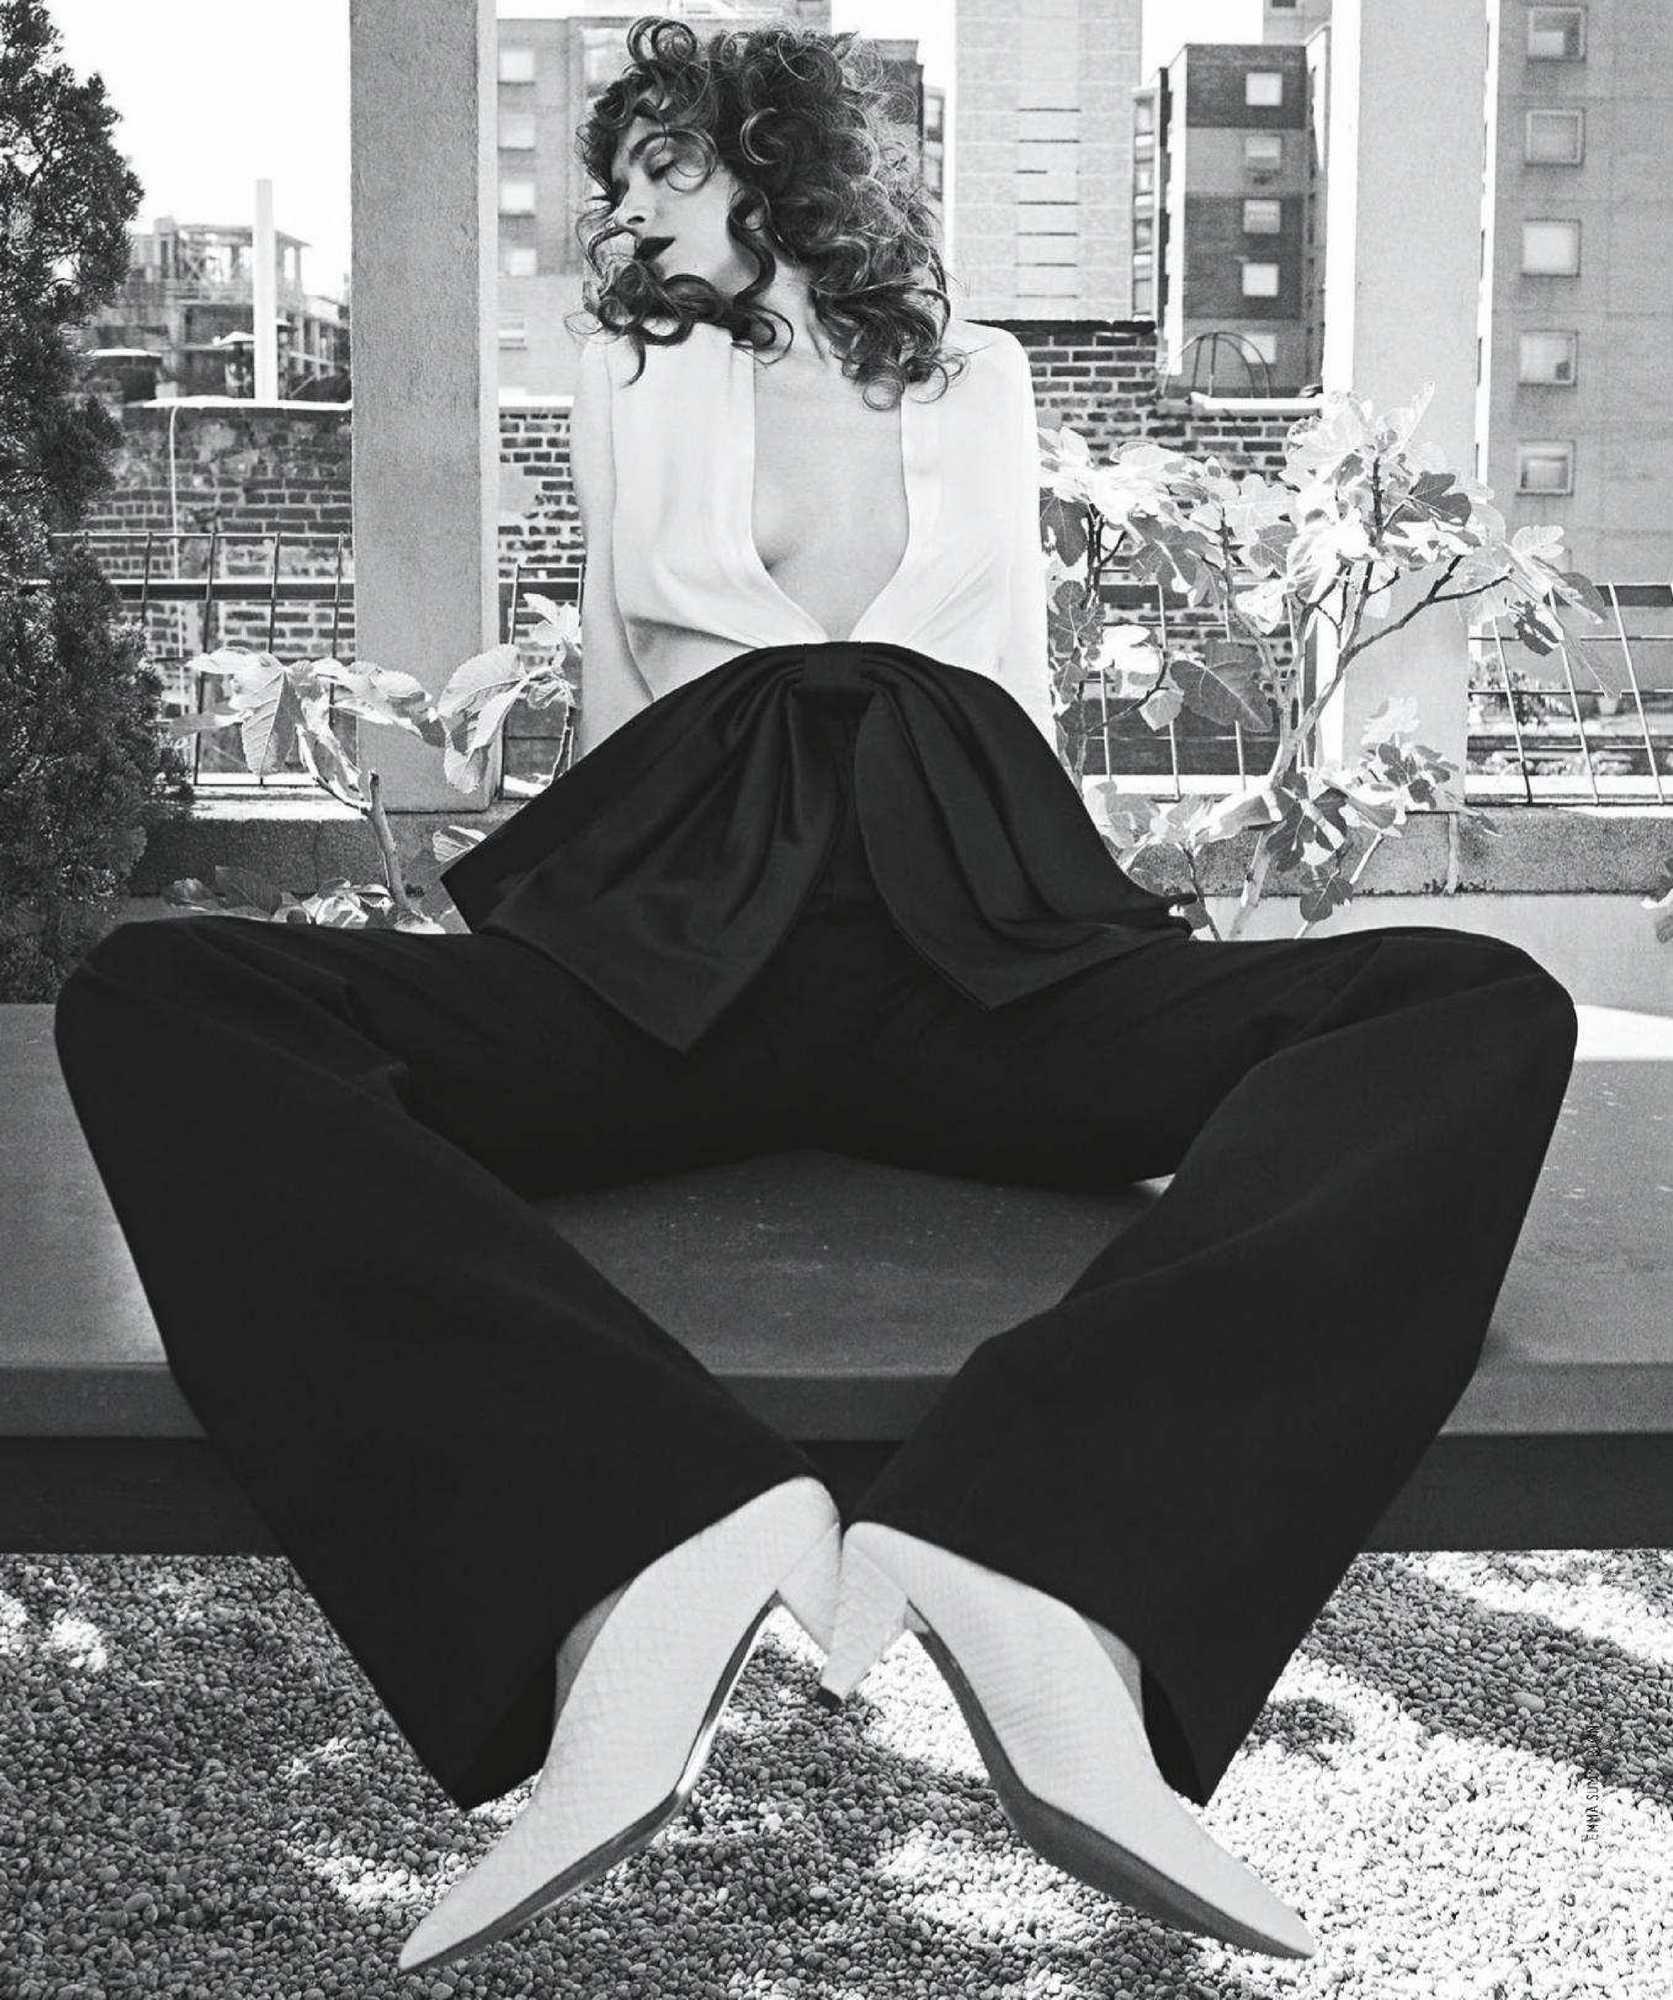 Dakota-Johnson-Emma-Summerton-Photoshoot-for-Vogue-Australia-October-2018e22748982741874.jpg